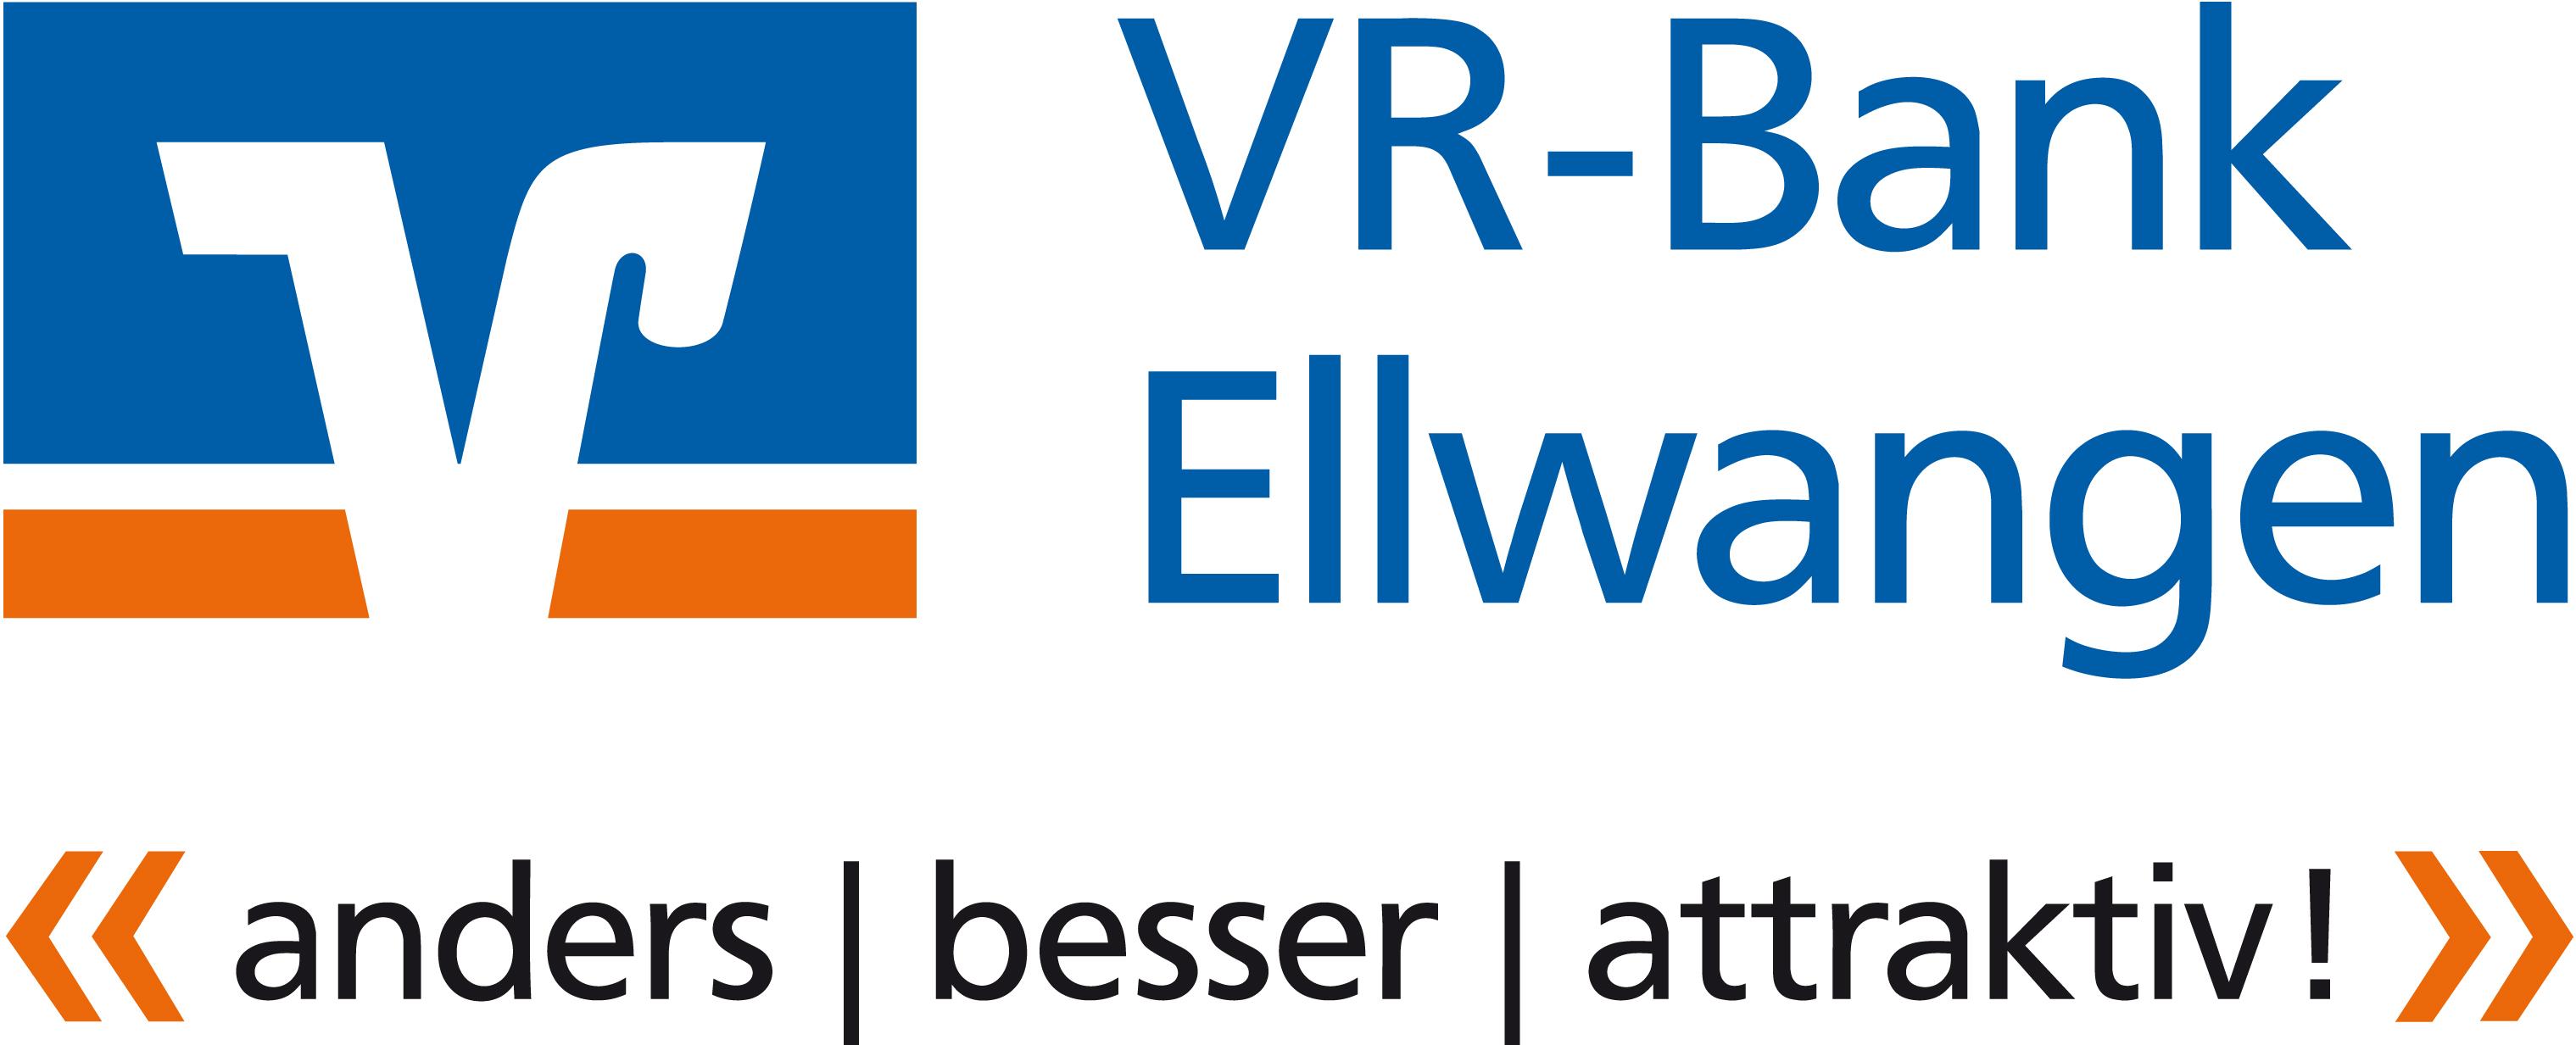 VR-Bank Ellwangen